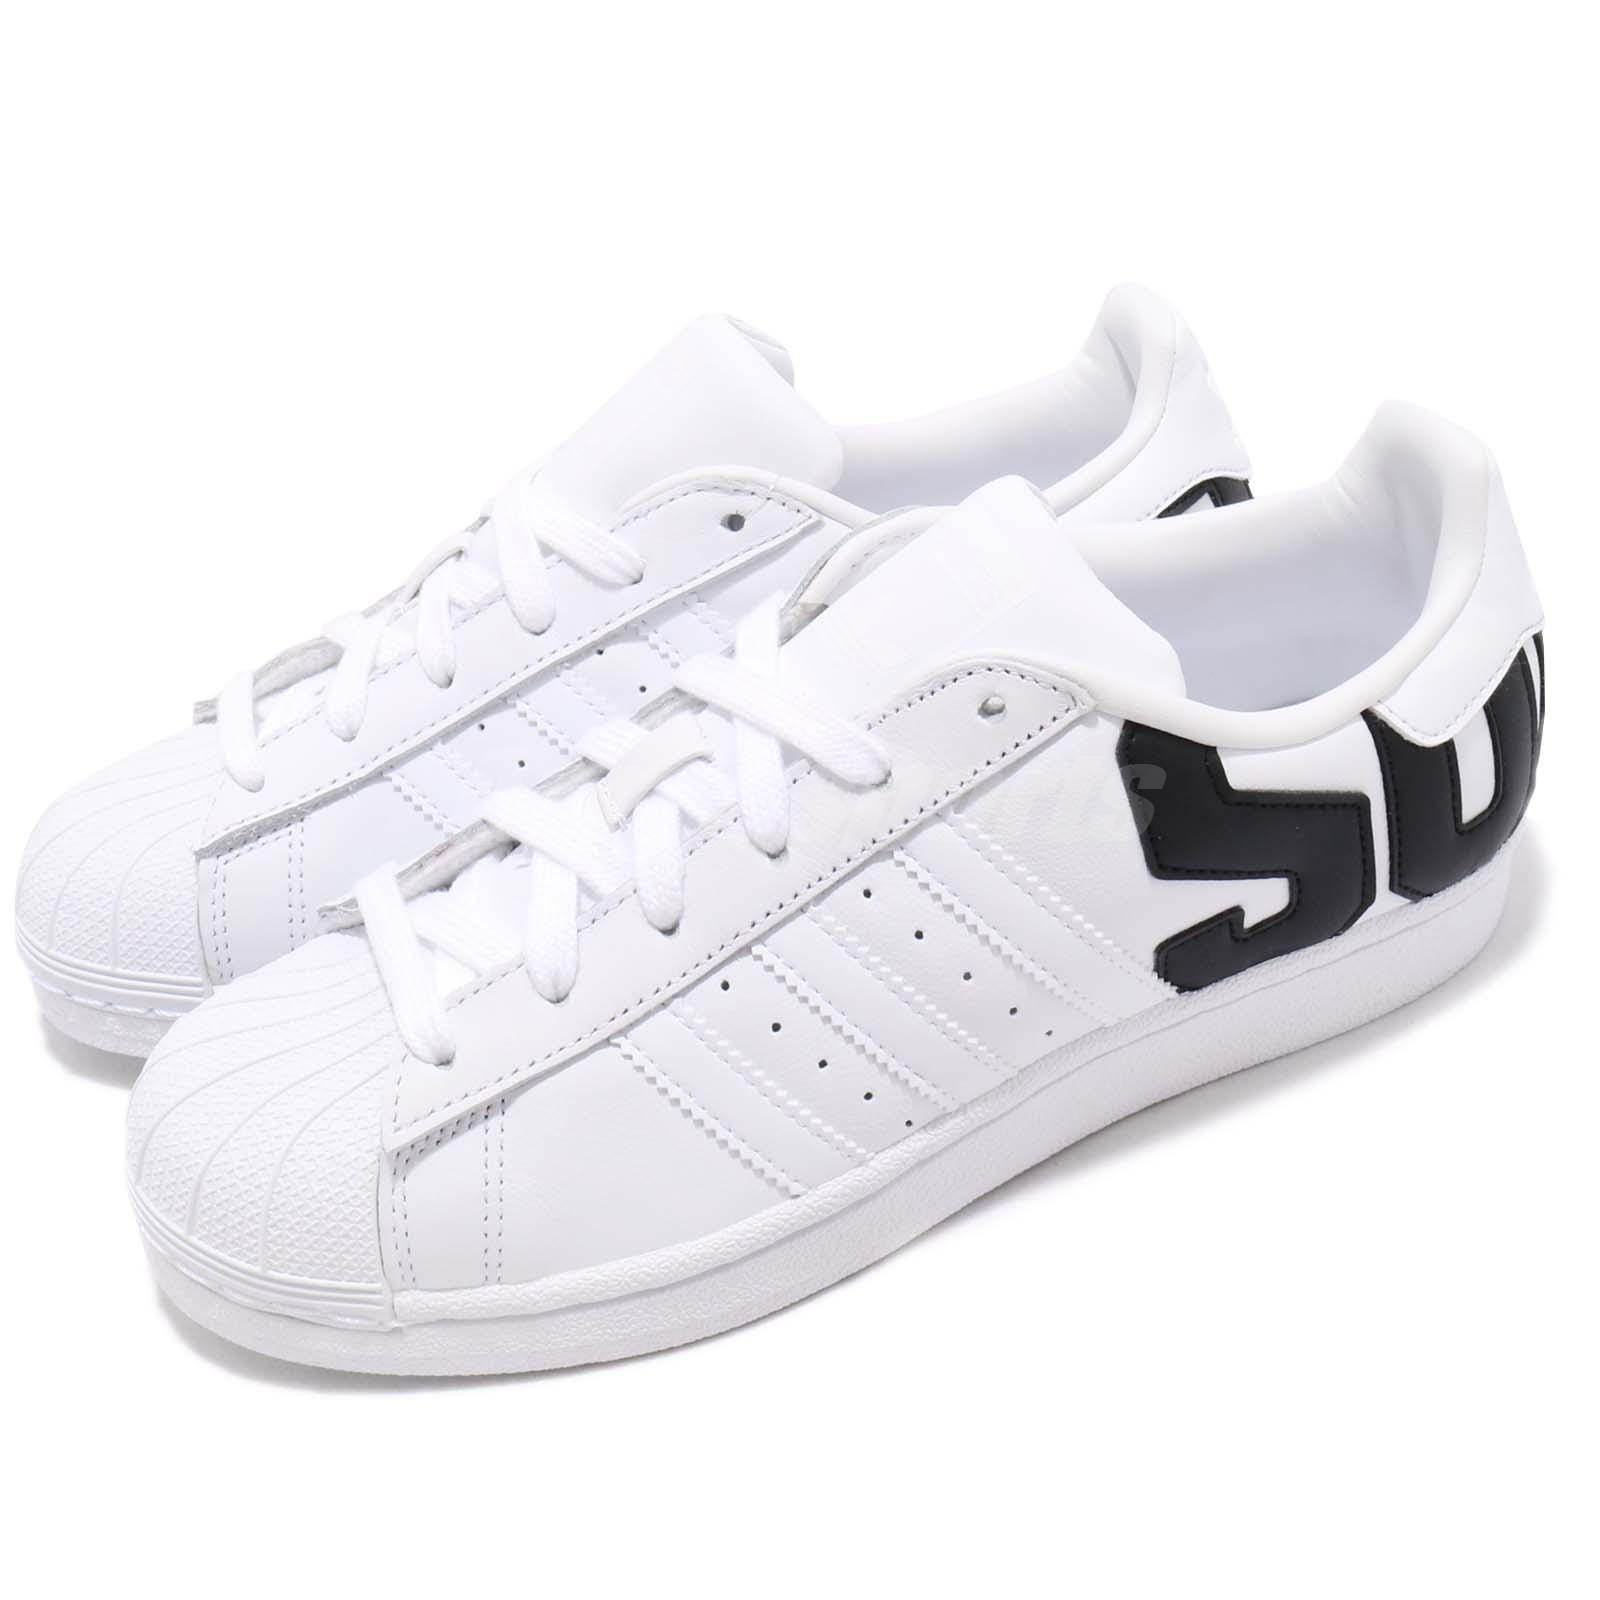 separation shoes bf94c 43125 Details about adidas Originals Superstar Big Logo White Black Men Women  Casual Shoes B37978